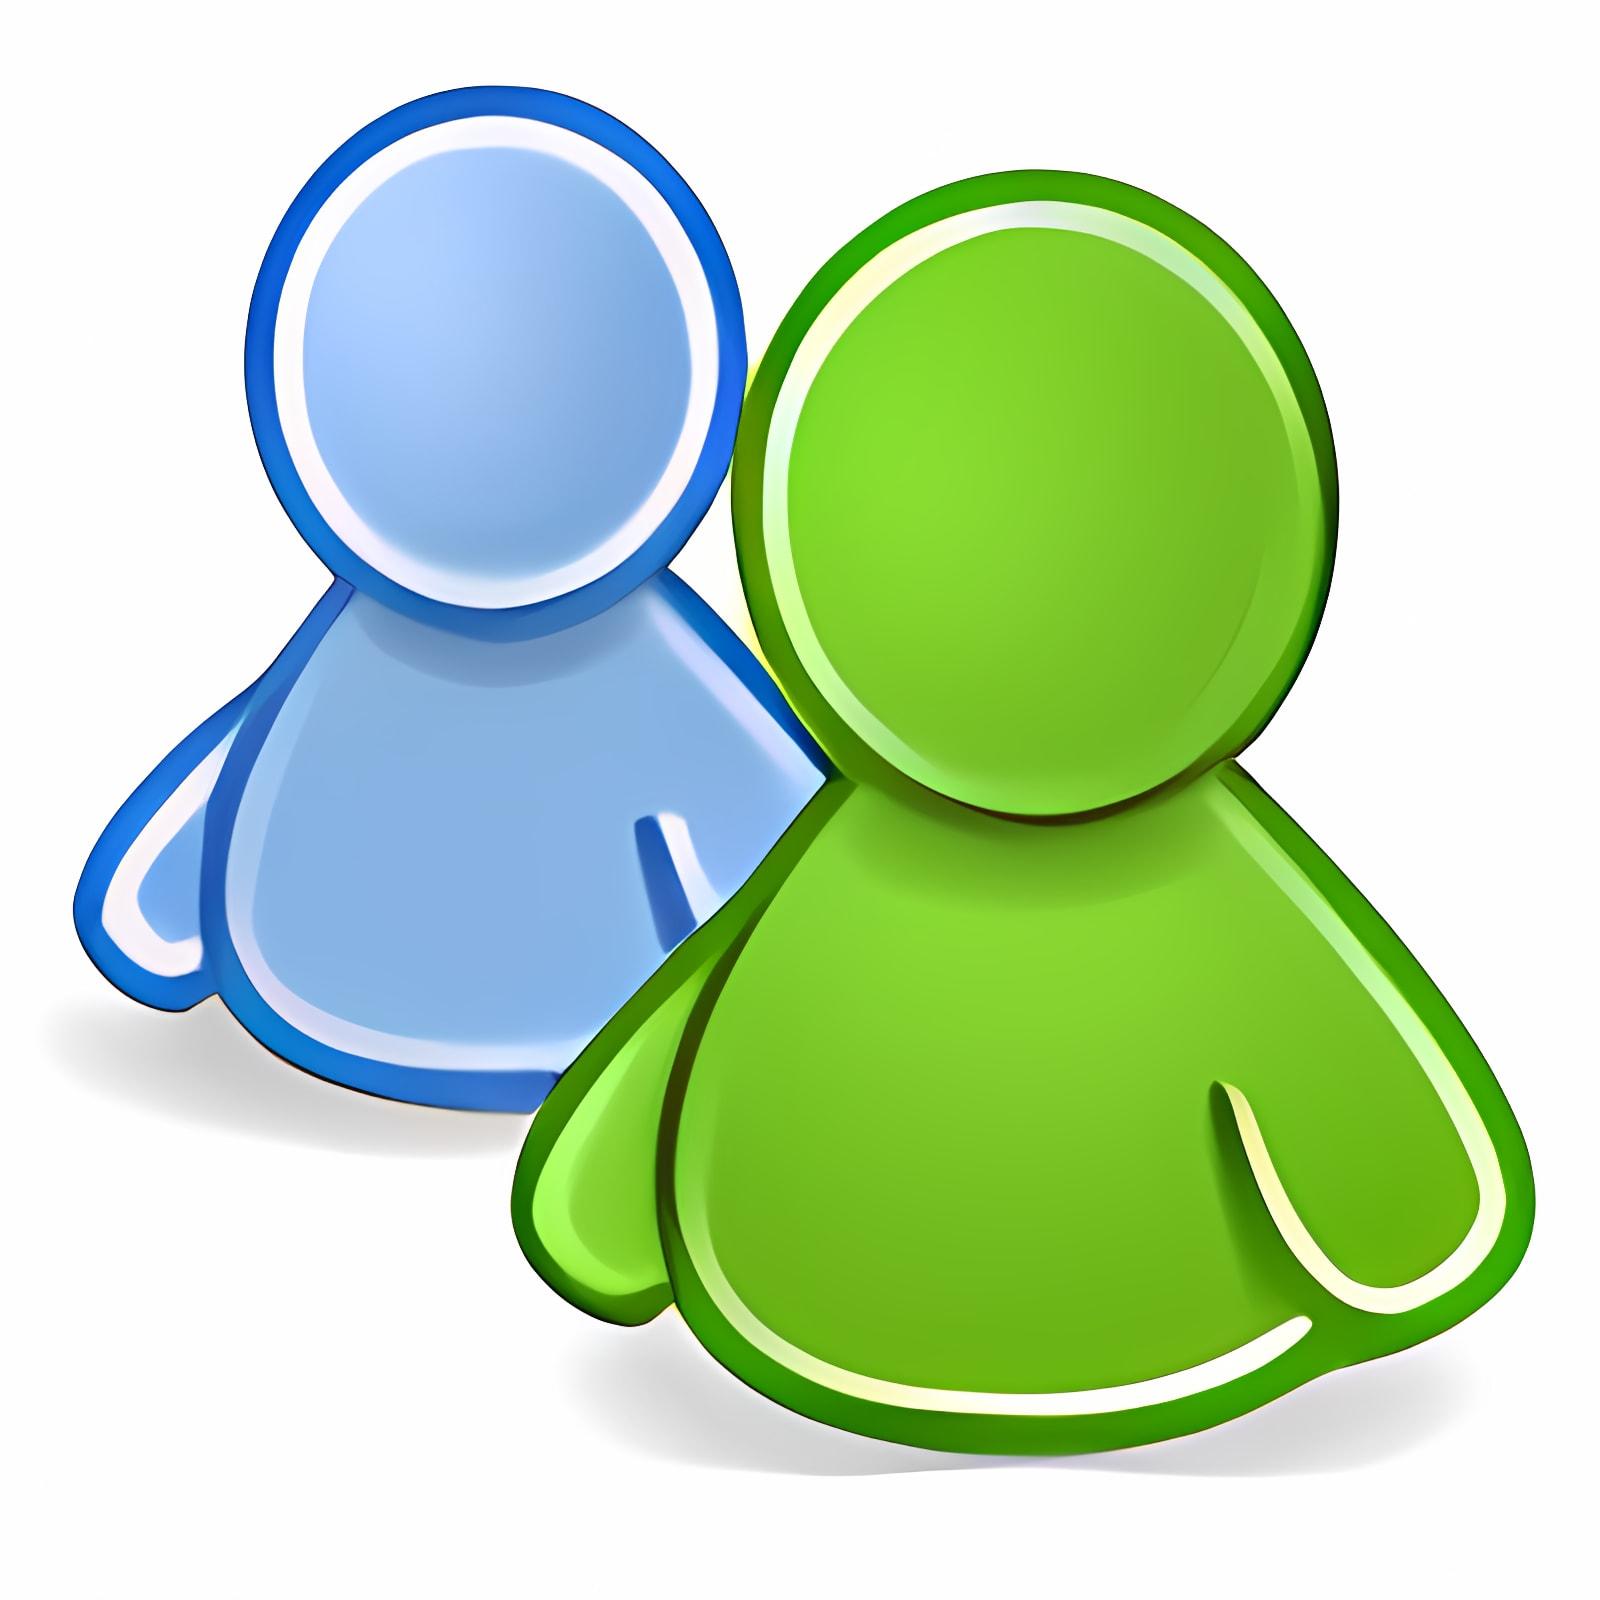 Emesene Messenger Portable 2.11.7